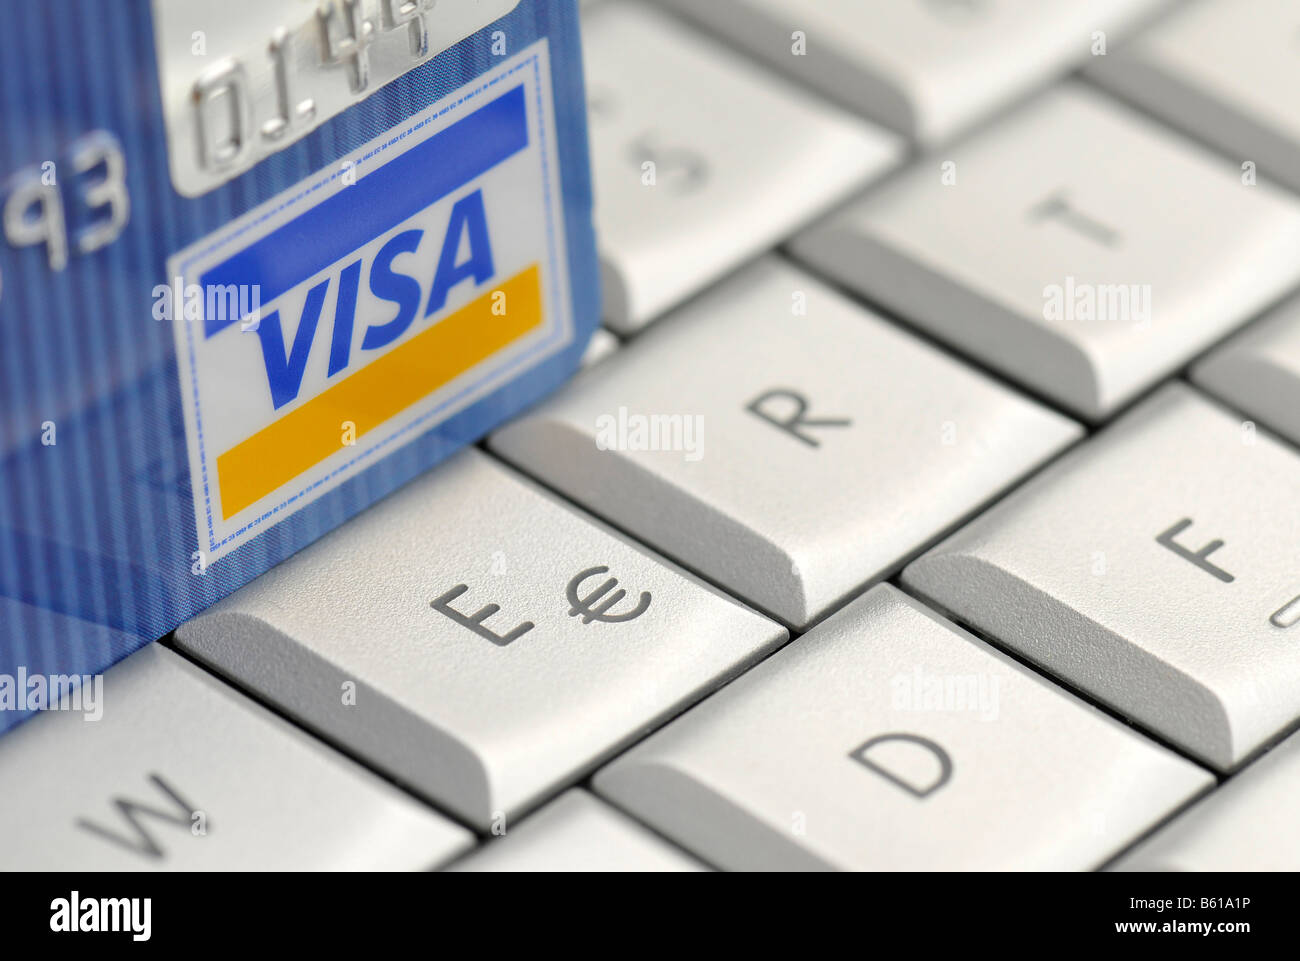 Visa Symbol Visa Stock Photos Visa Symbol Visa Stock Images Alamy